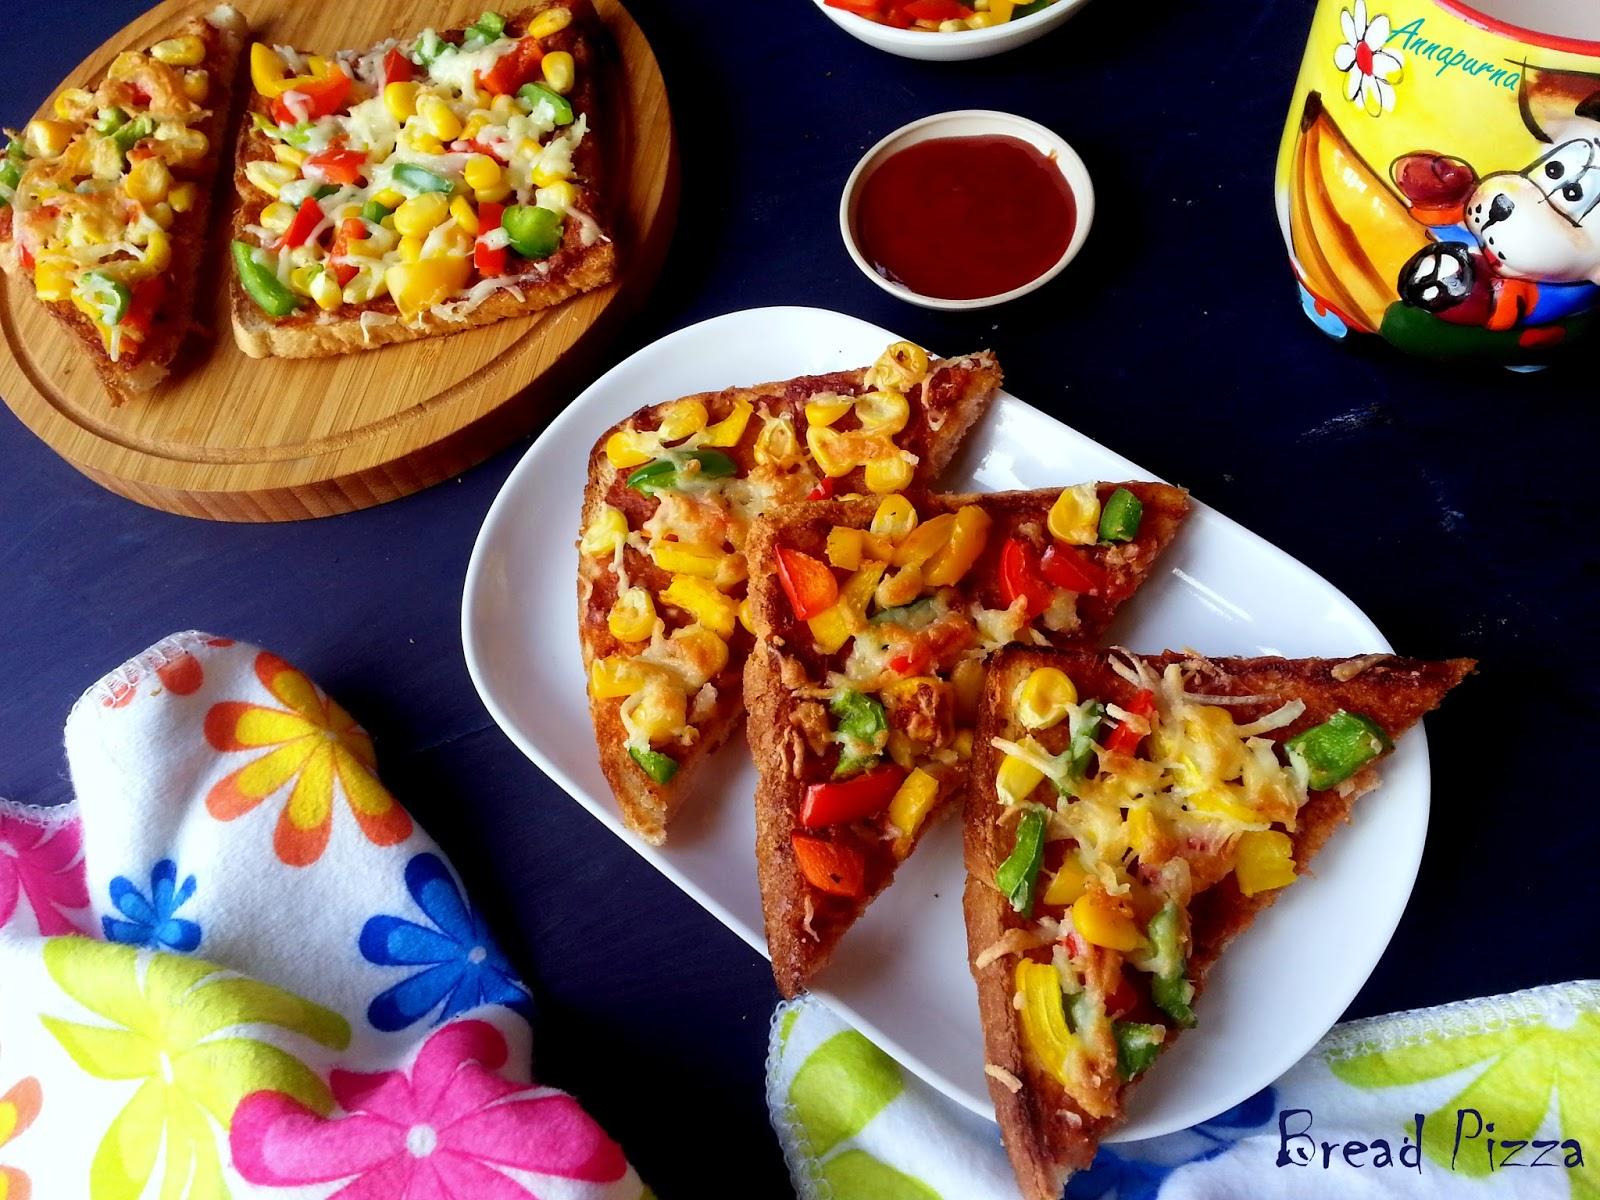 Indian food recipes indian recipes desi food desi recipes indian food recipes indian recipes desi food desi recipes south indian recipes north indian recipes itspotluck forumfinder Images